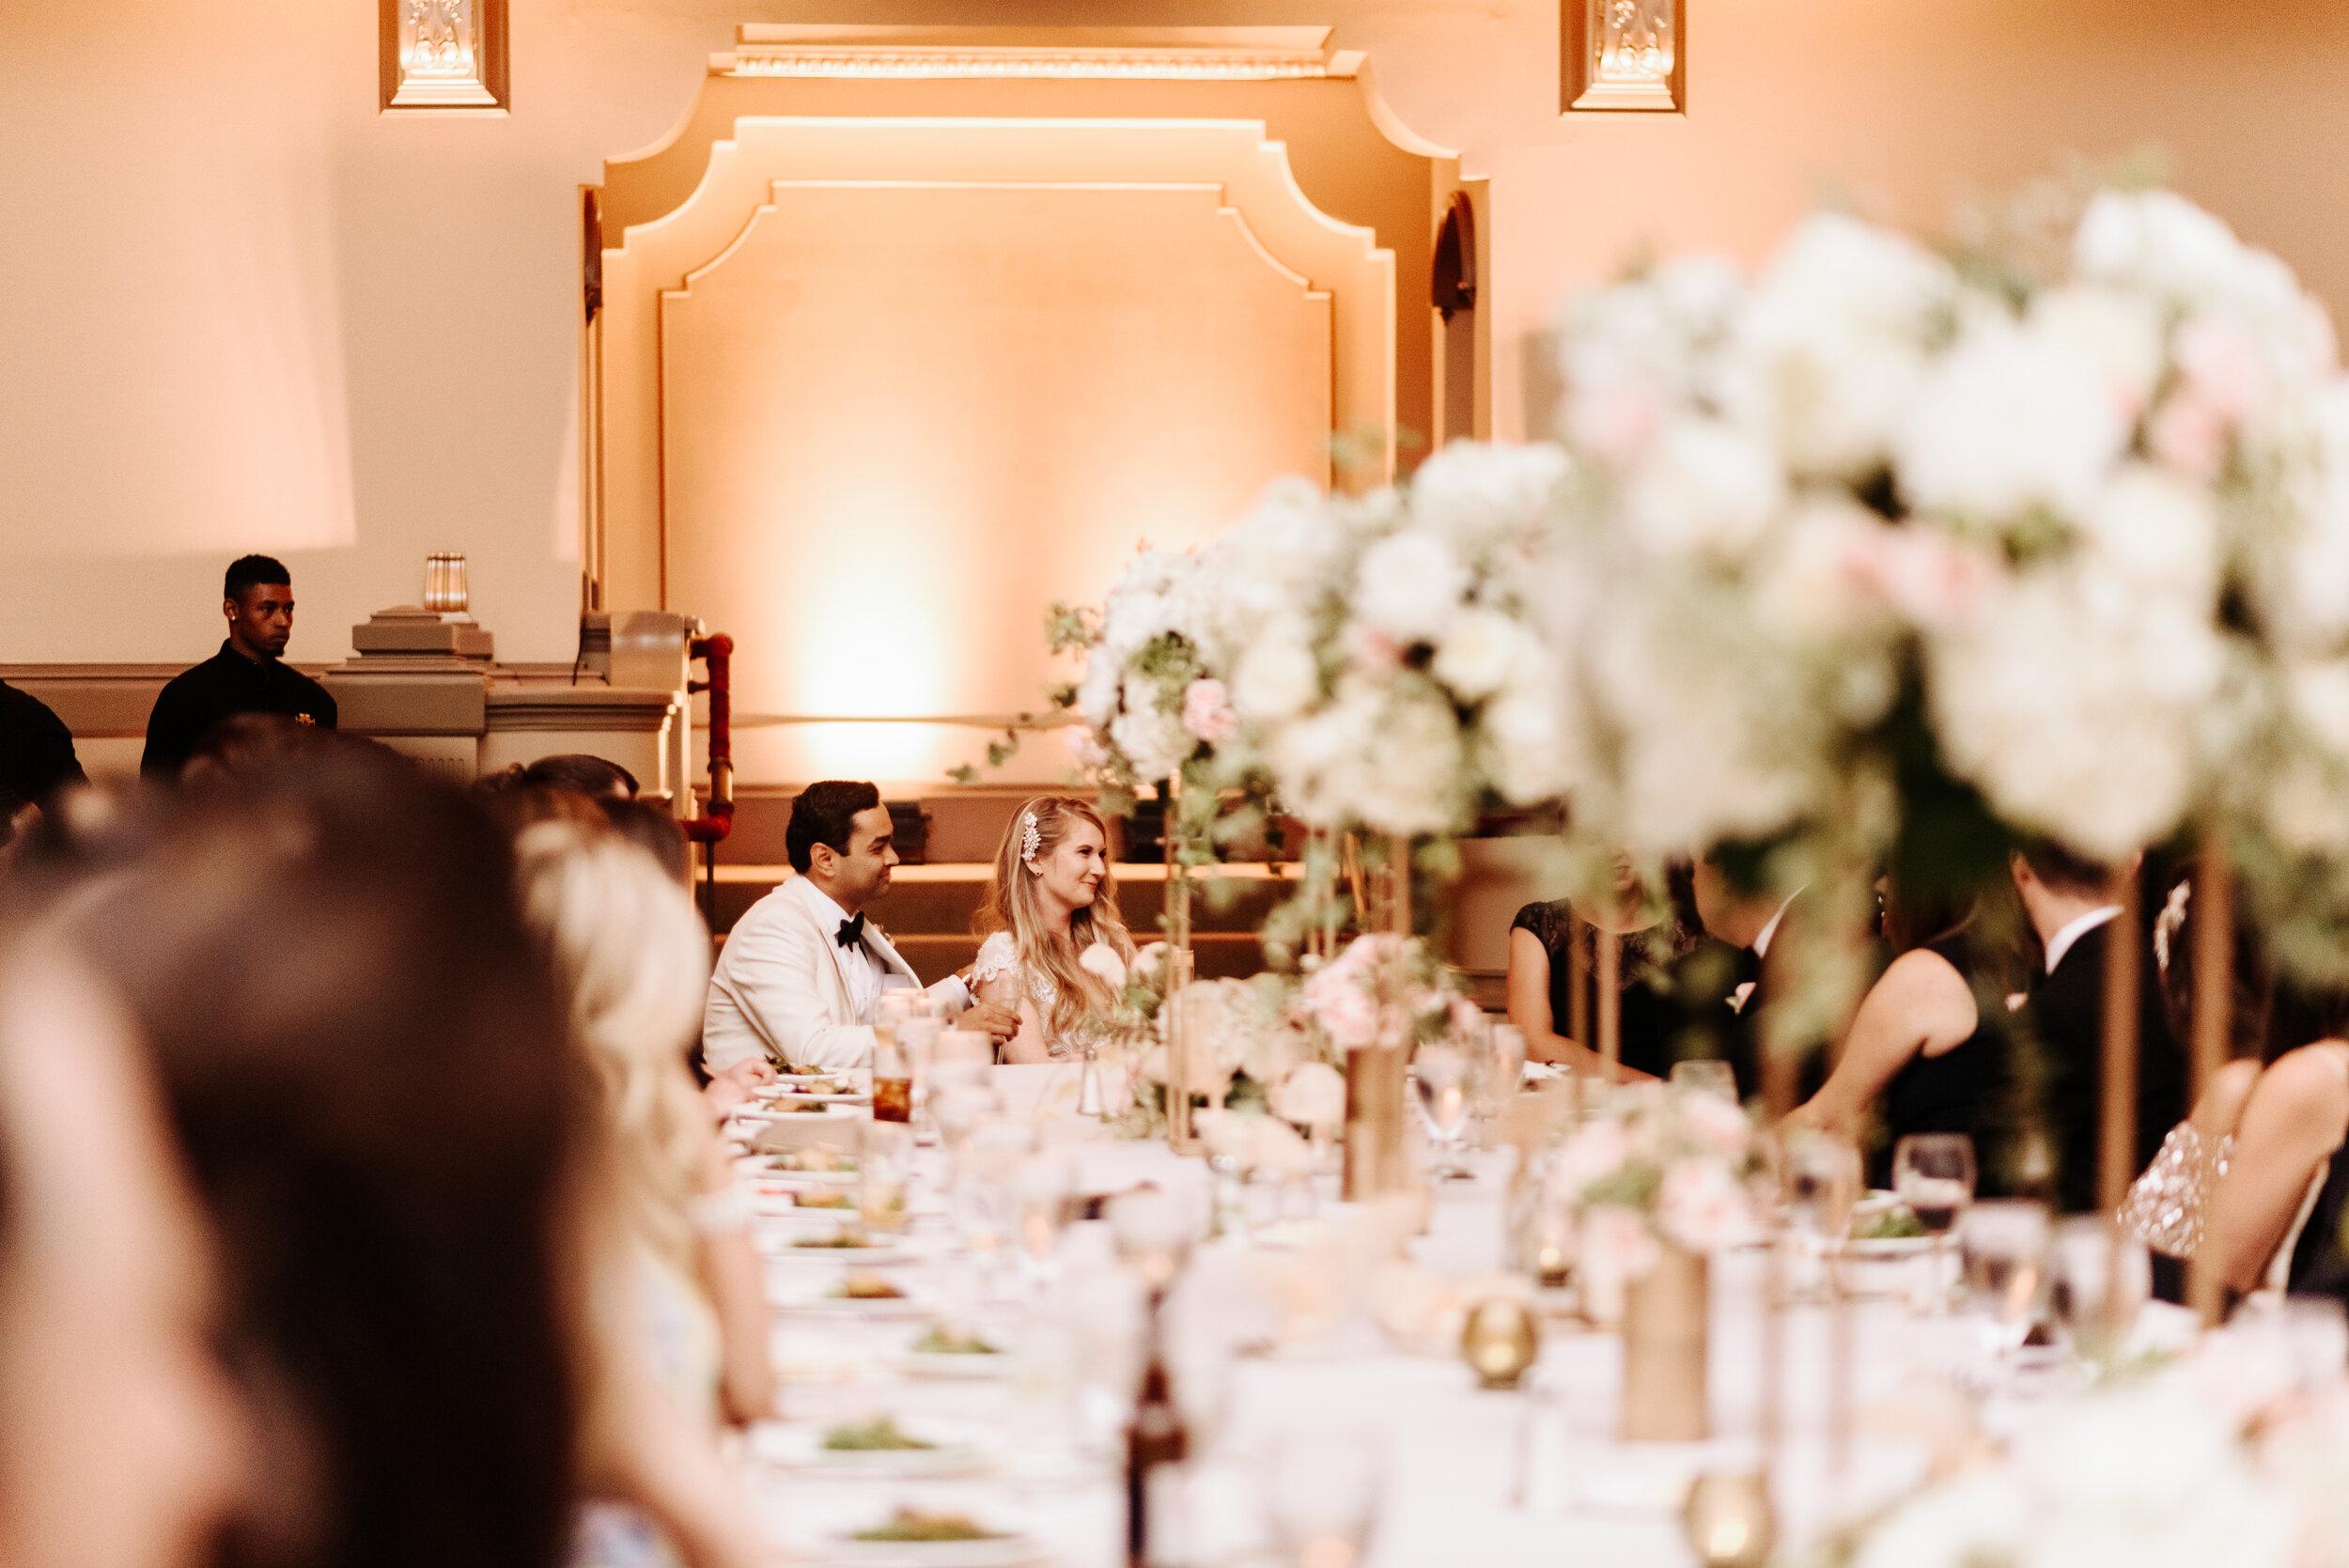 Cassie-Mrunal-Wedding-Quirk-Hotel-John-Marshall-Ballrooms-Richmond-Virginia-Photography-by-V-100.jpg